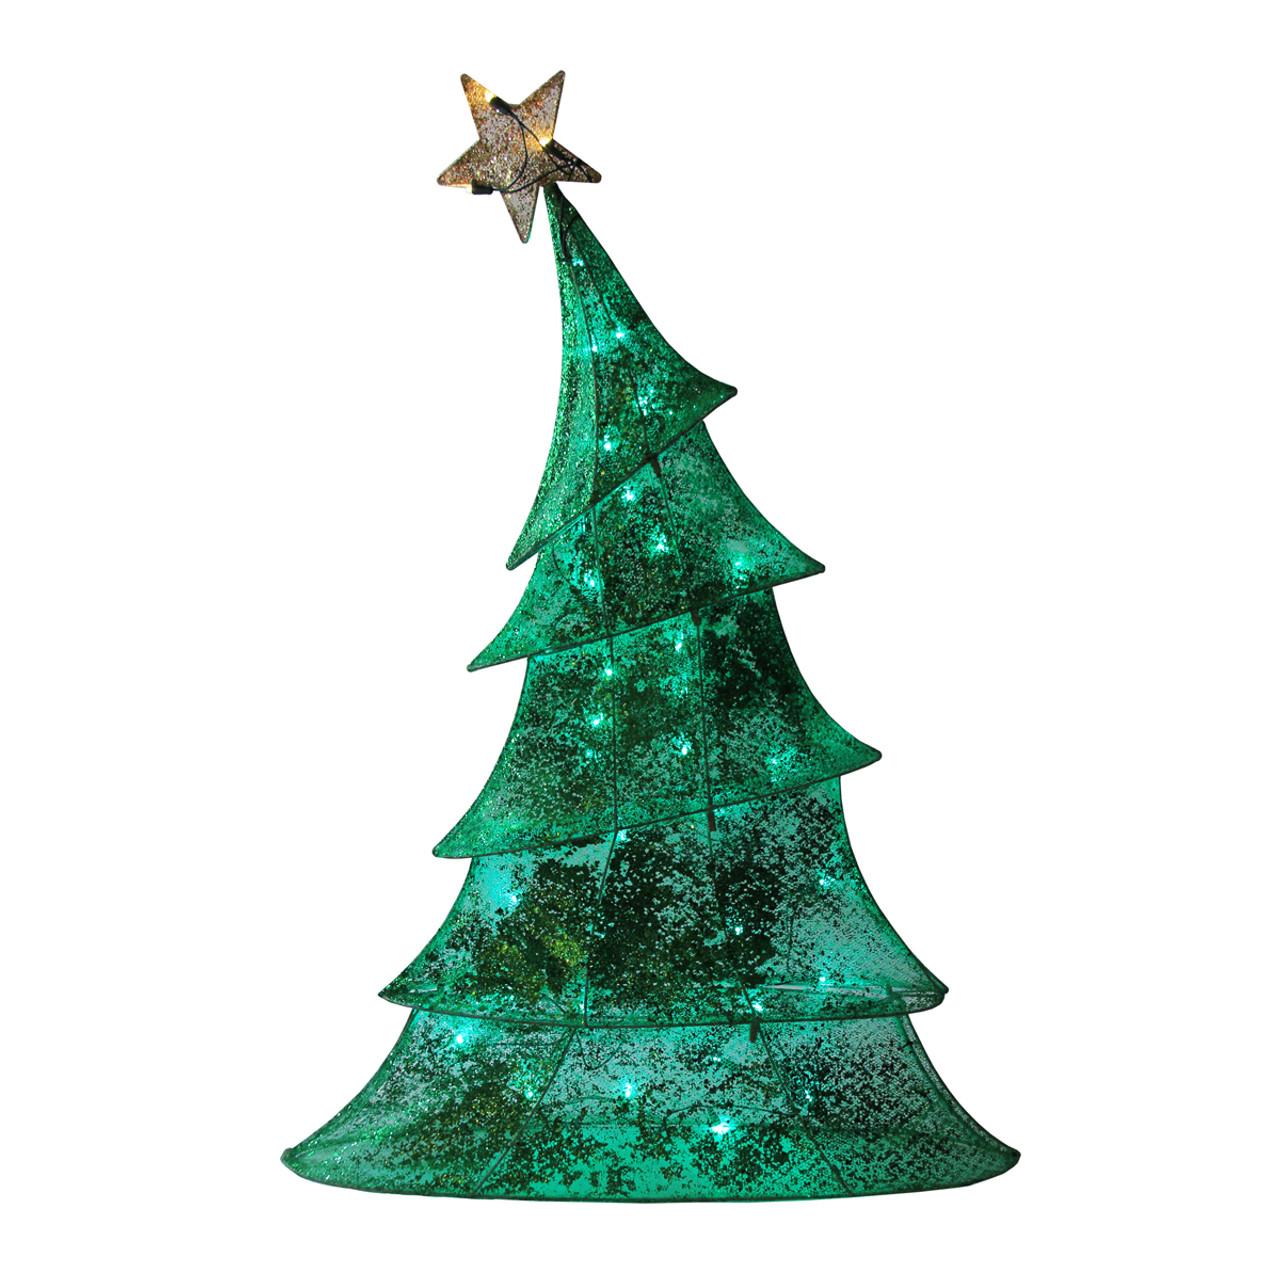 "Lighted Christmas Tree Yard Decorations: 48"" LED Lighted 2D Green Glitter Mesh Whimsical Christmas"